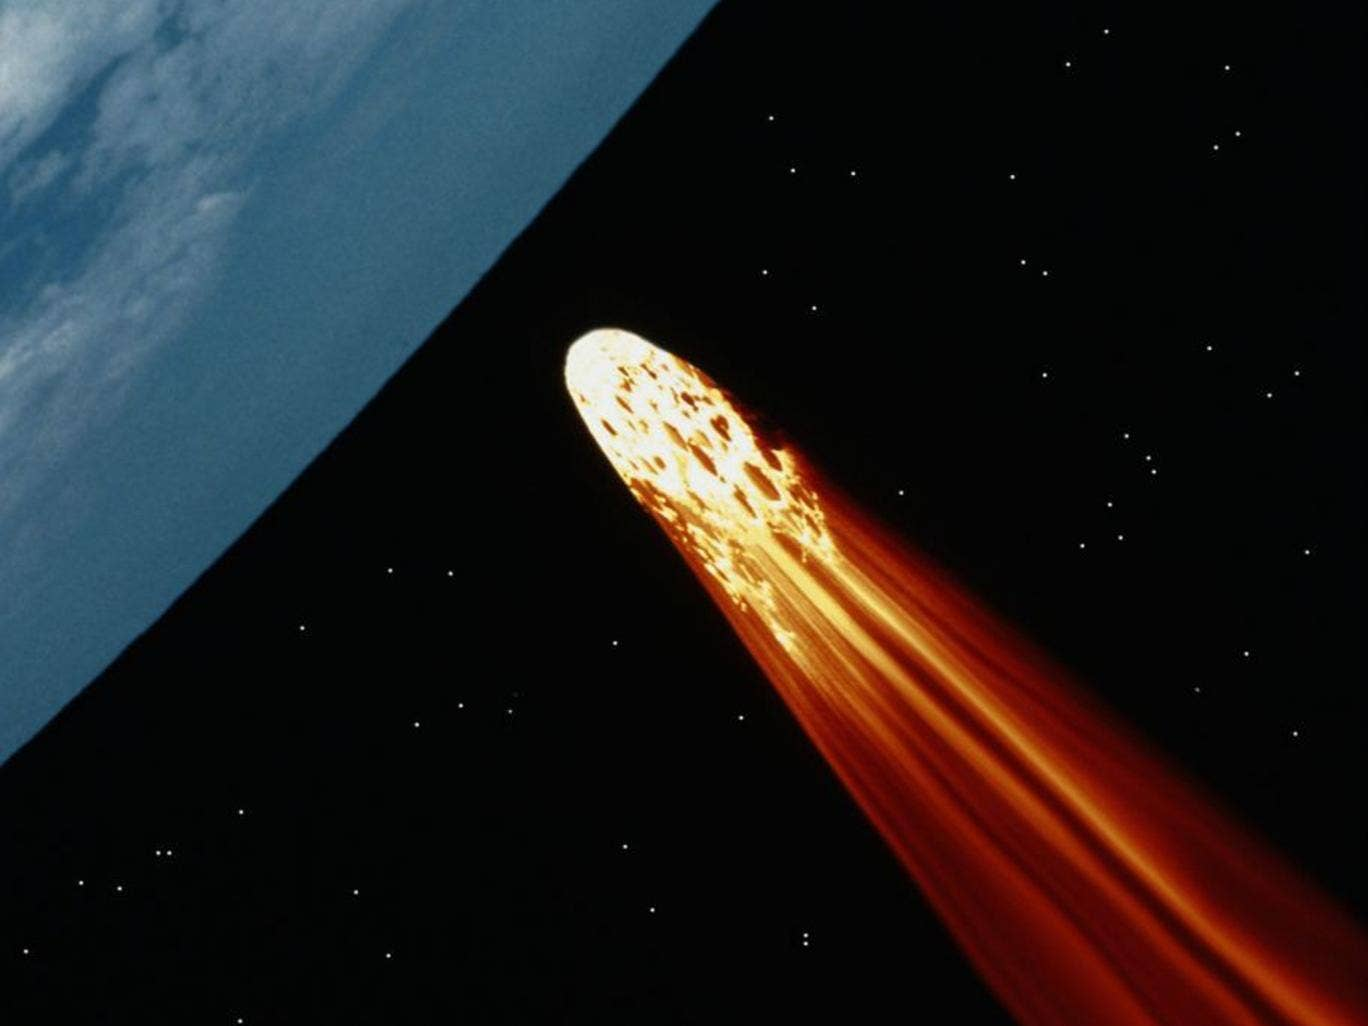 2012 DA14: A close call for asteroid big enough to flatten ...